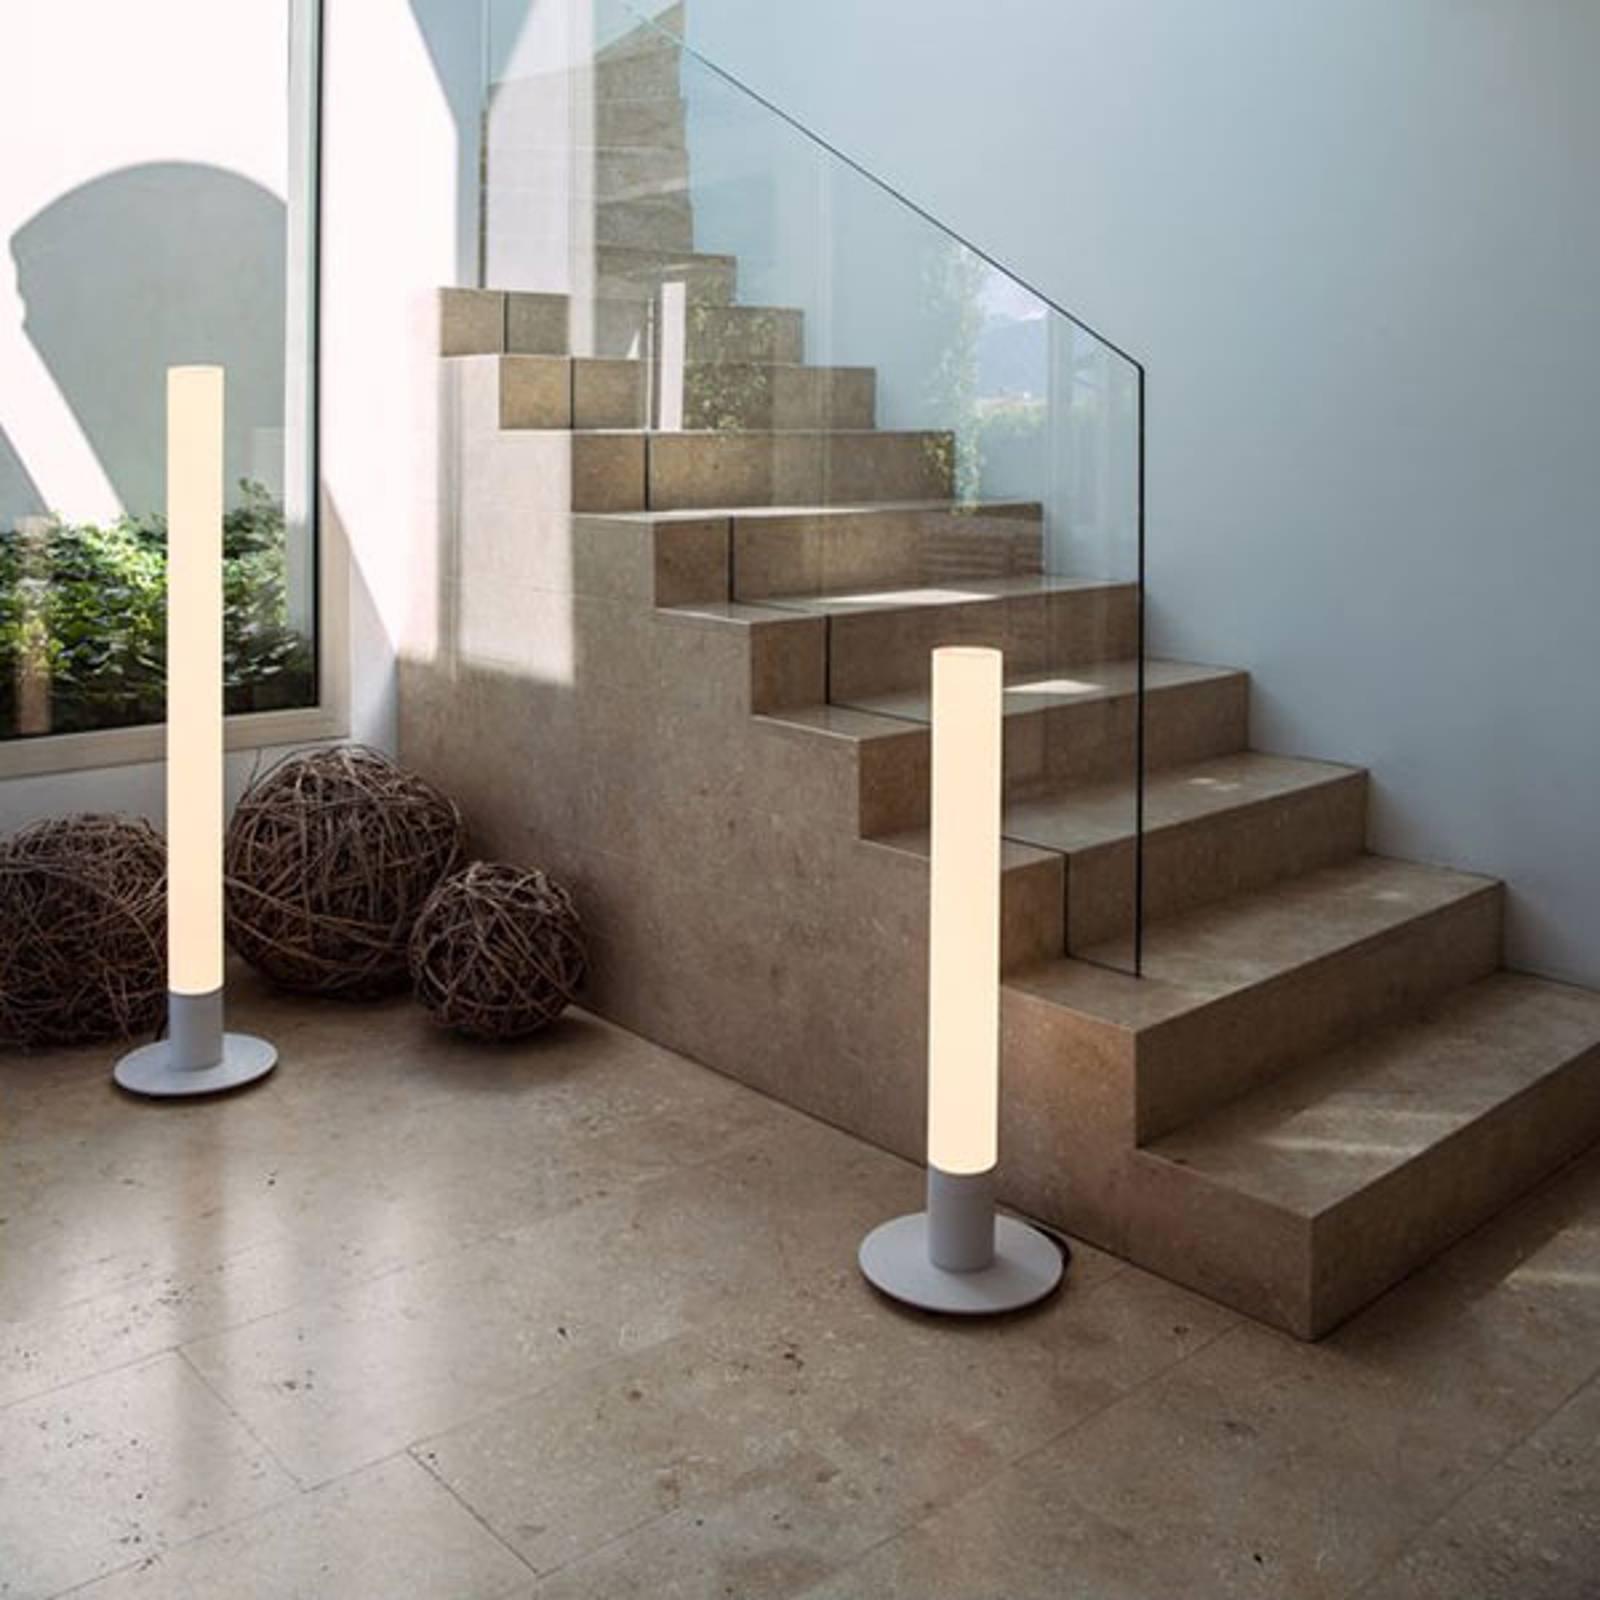 SLV Light Pipe LED-gulvlampe, dimbar, IP55, 90 cm